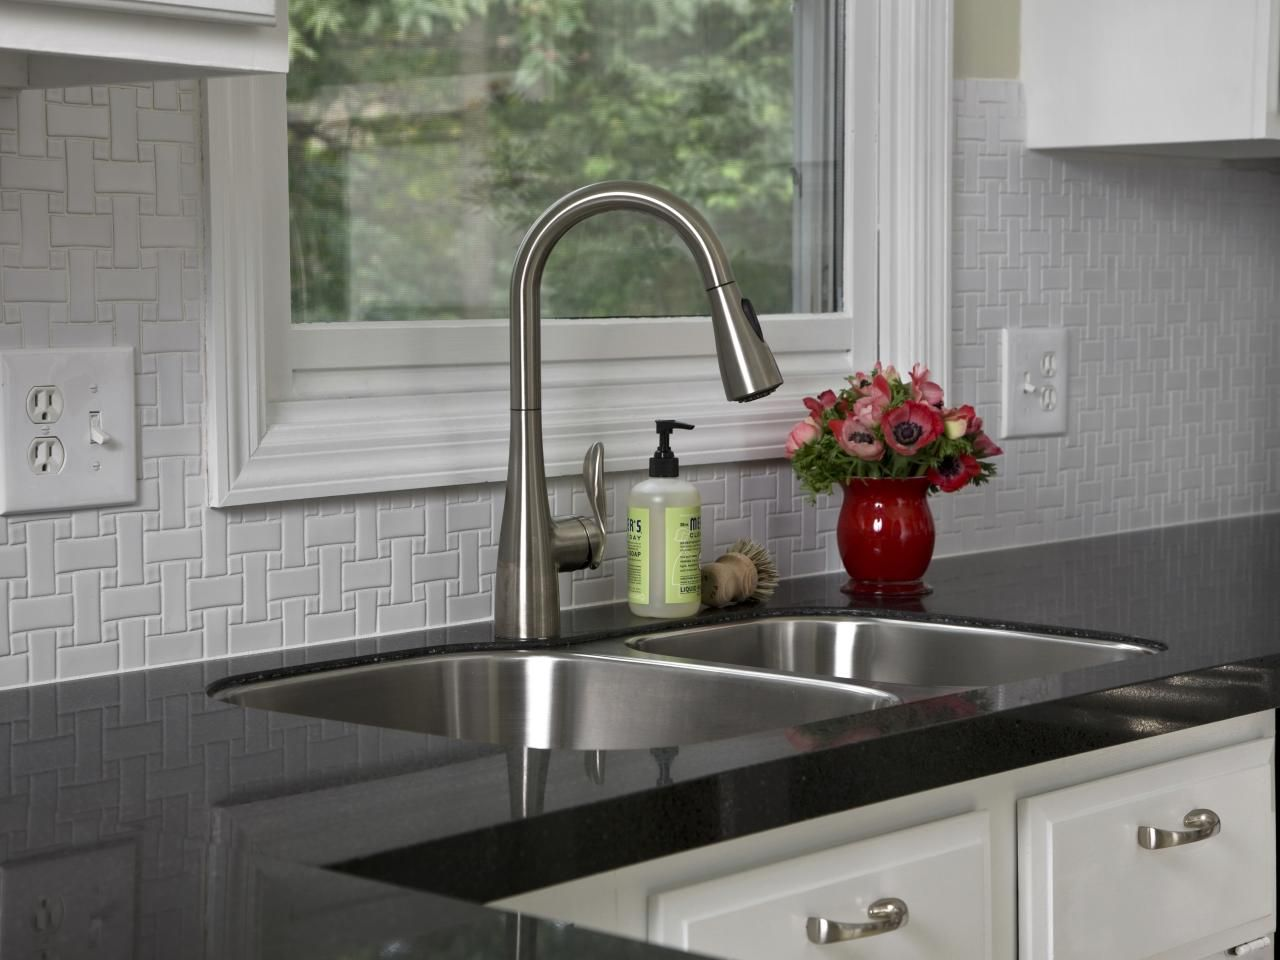 Laminate Kitchen Countertop Ceramic Tile BacksplashBacksplash IdeasWall